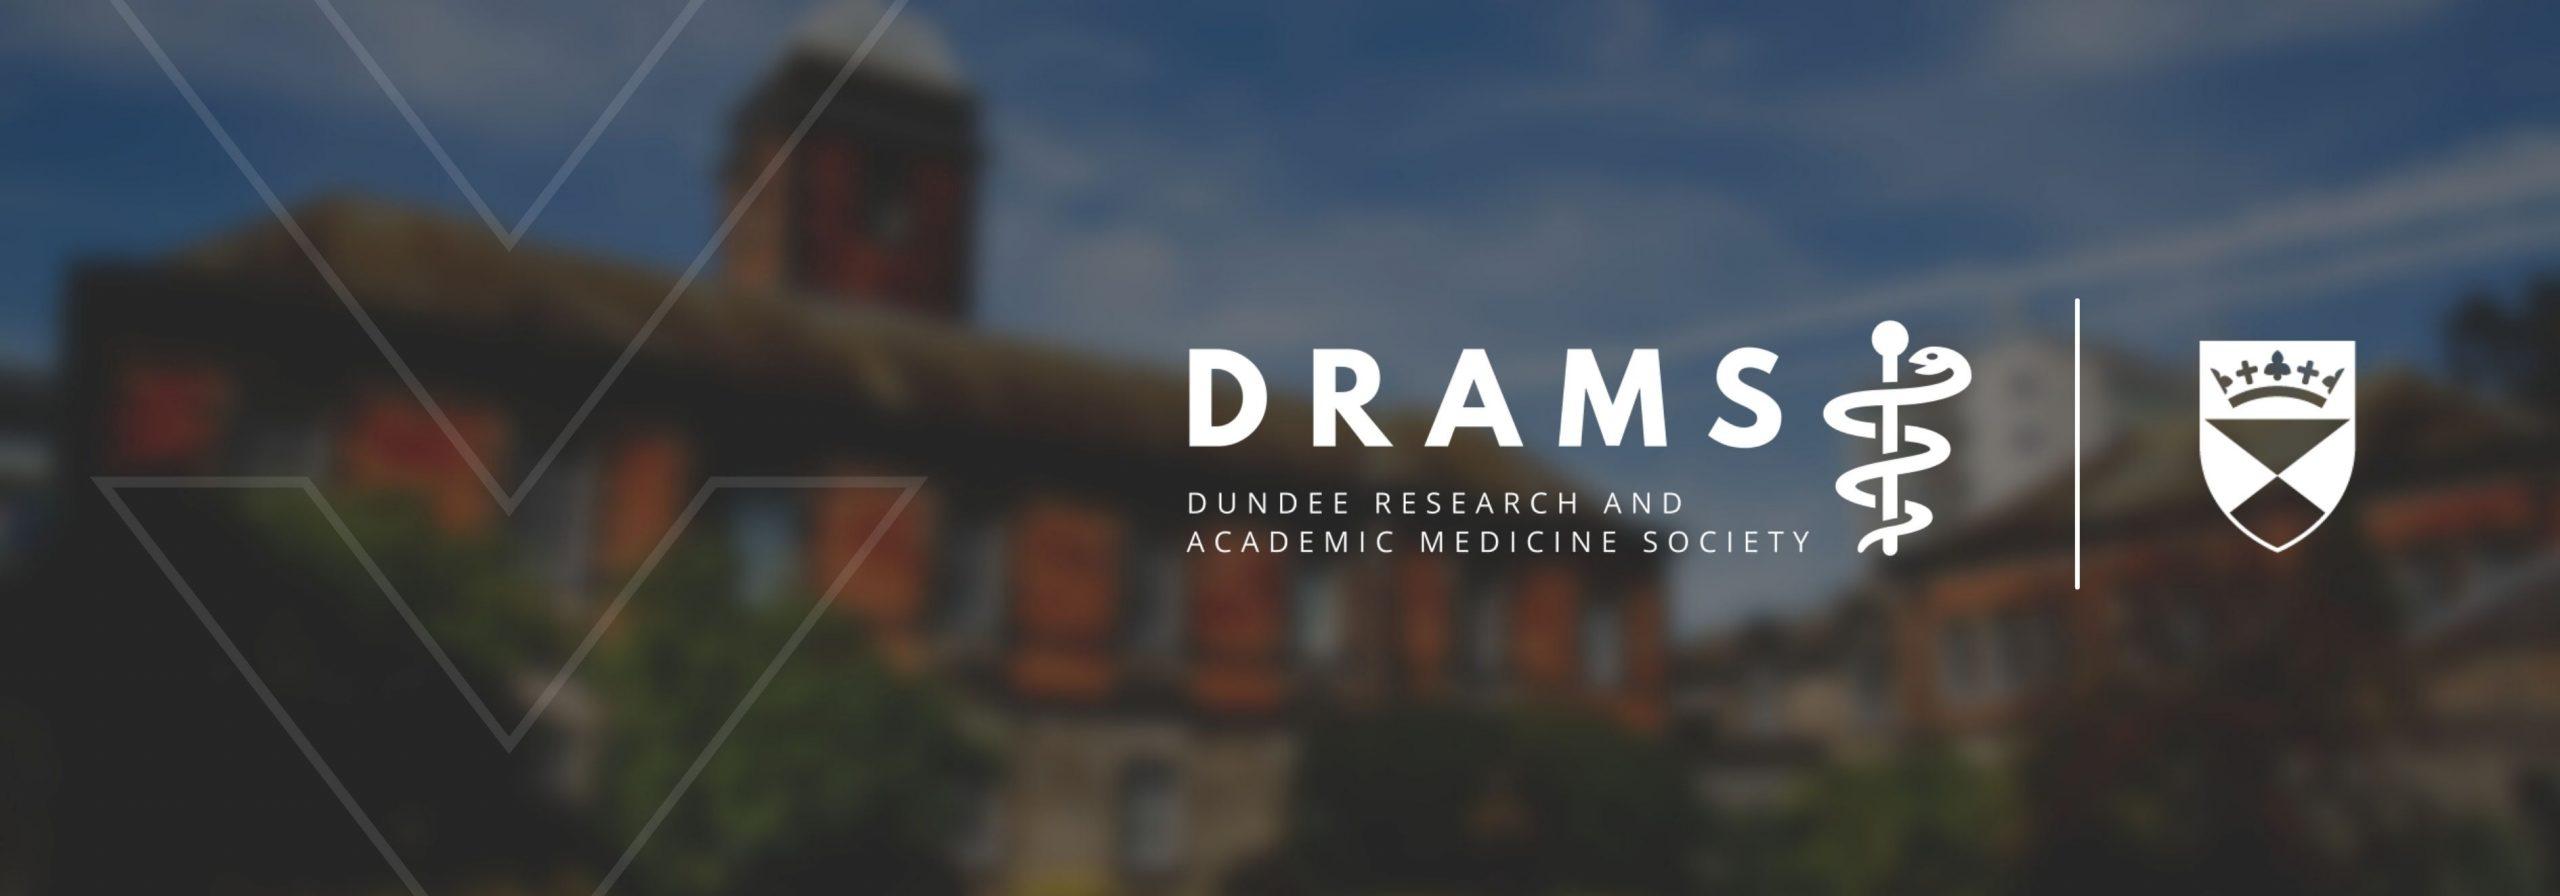 DRAMS - HOME CAROUSEL